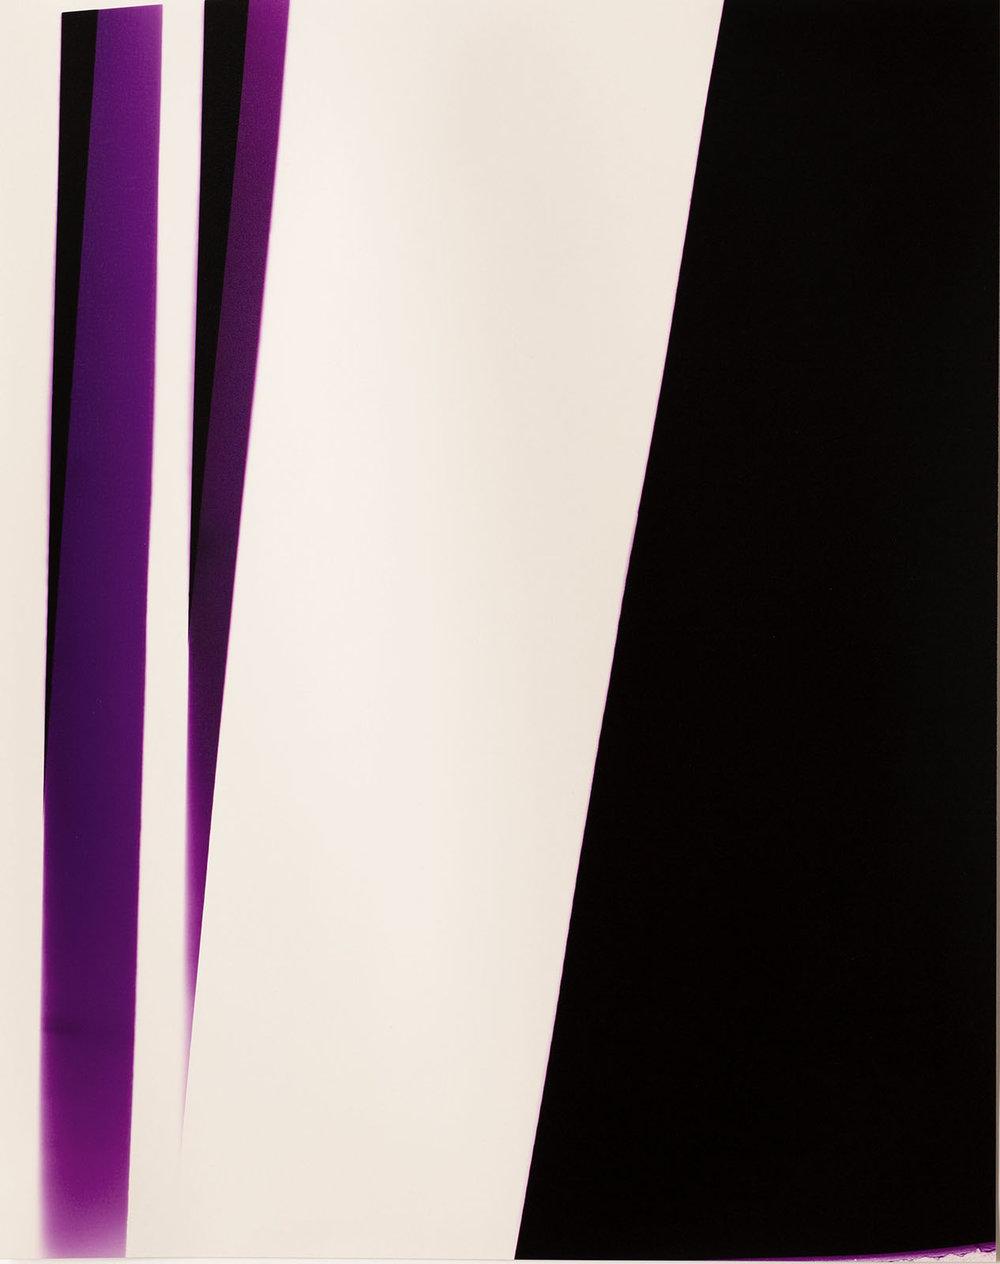 Cati Bestard,  Light 3  , 2018. 20 x 16 inches / 40.6 x 50.8 cm, C-print.